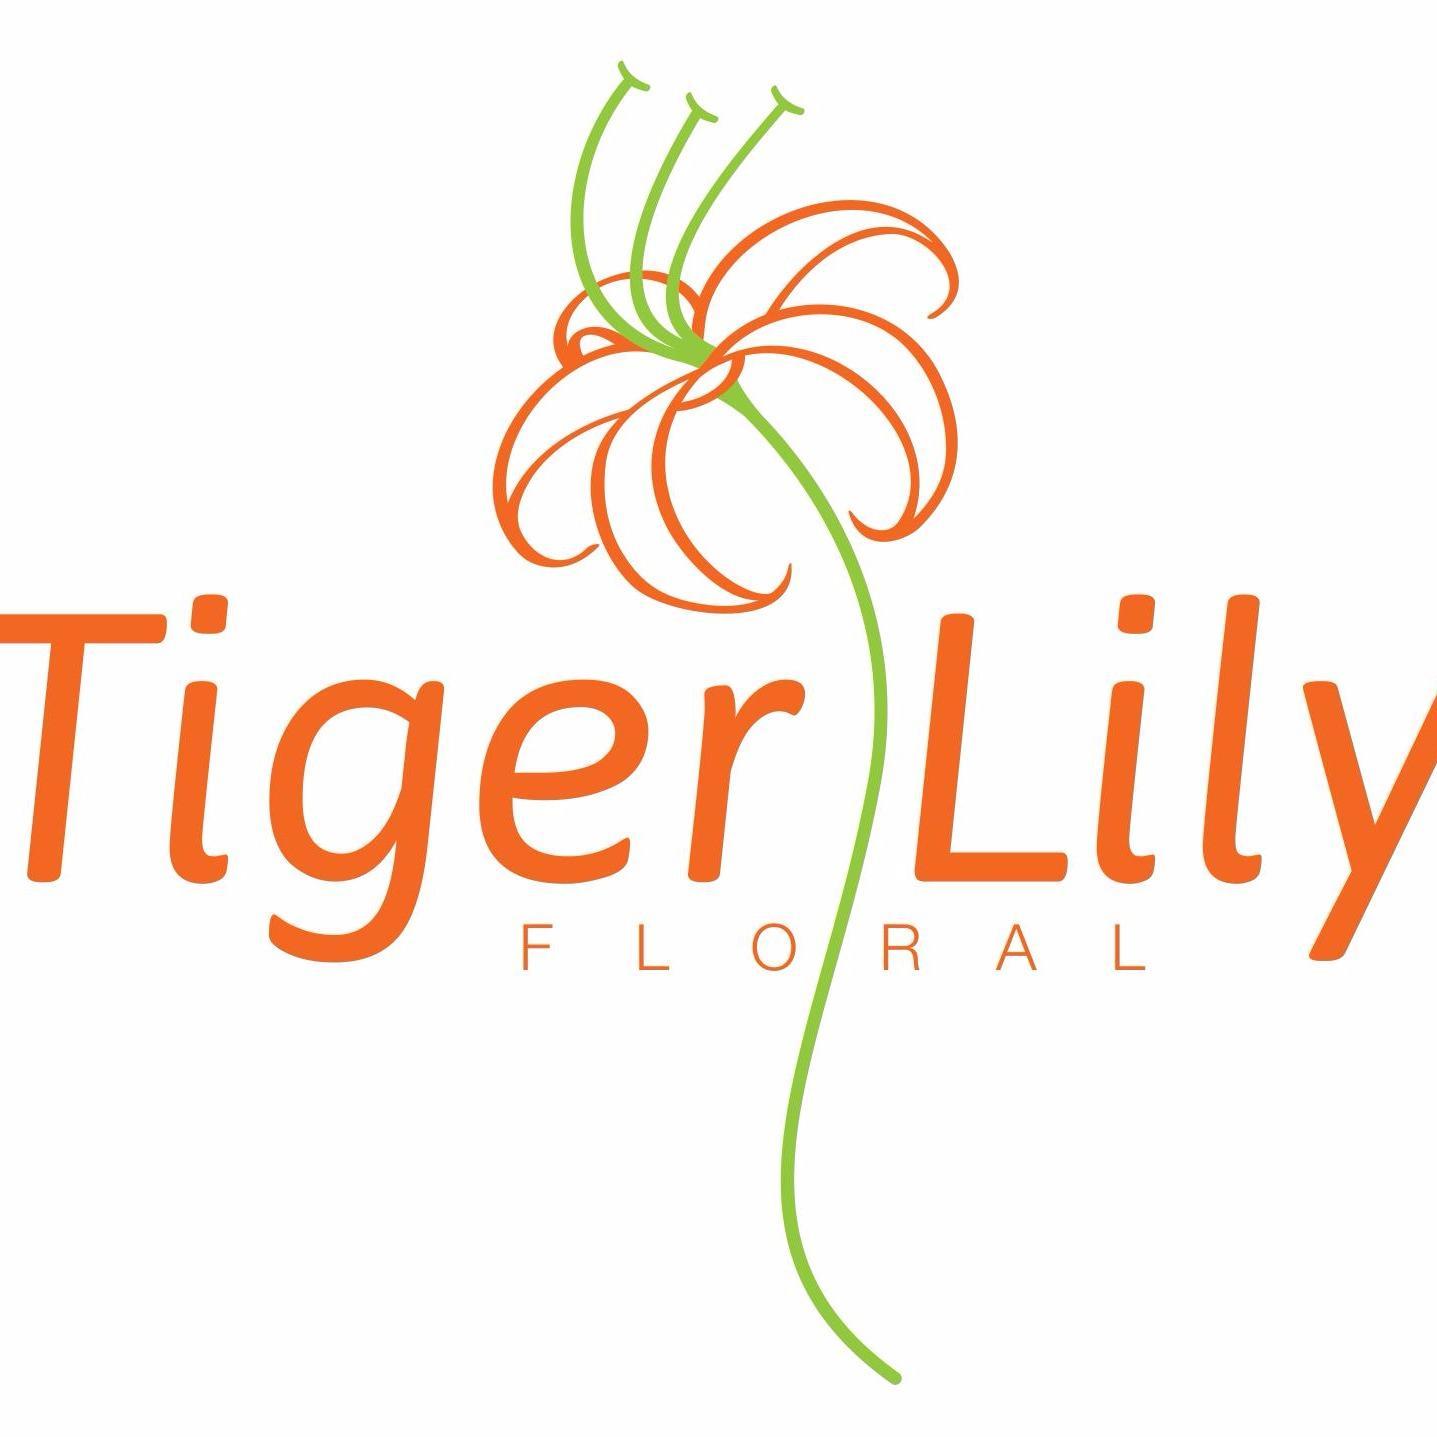 Tiger Lily Florist